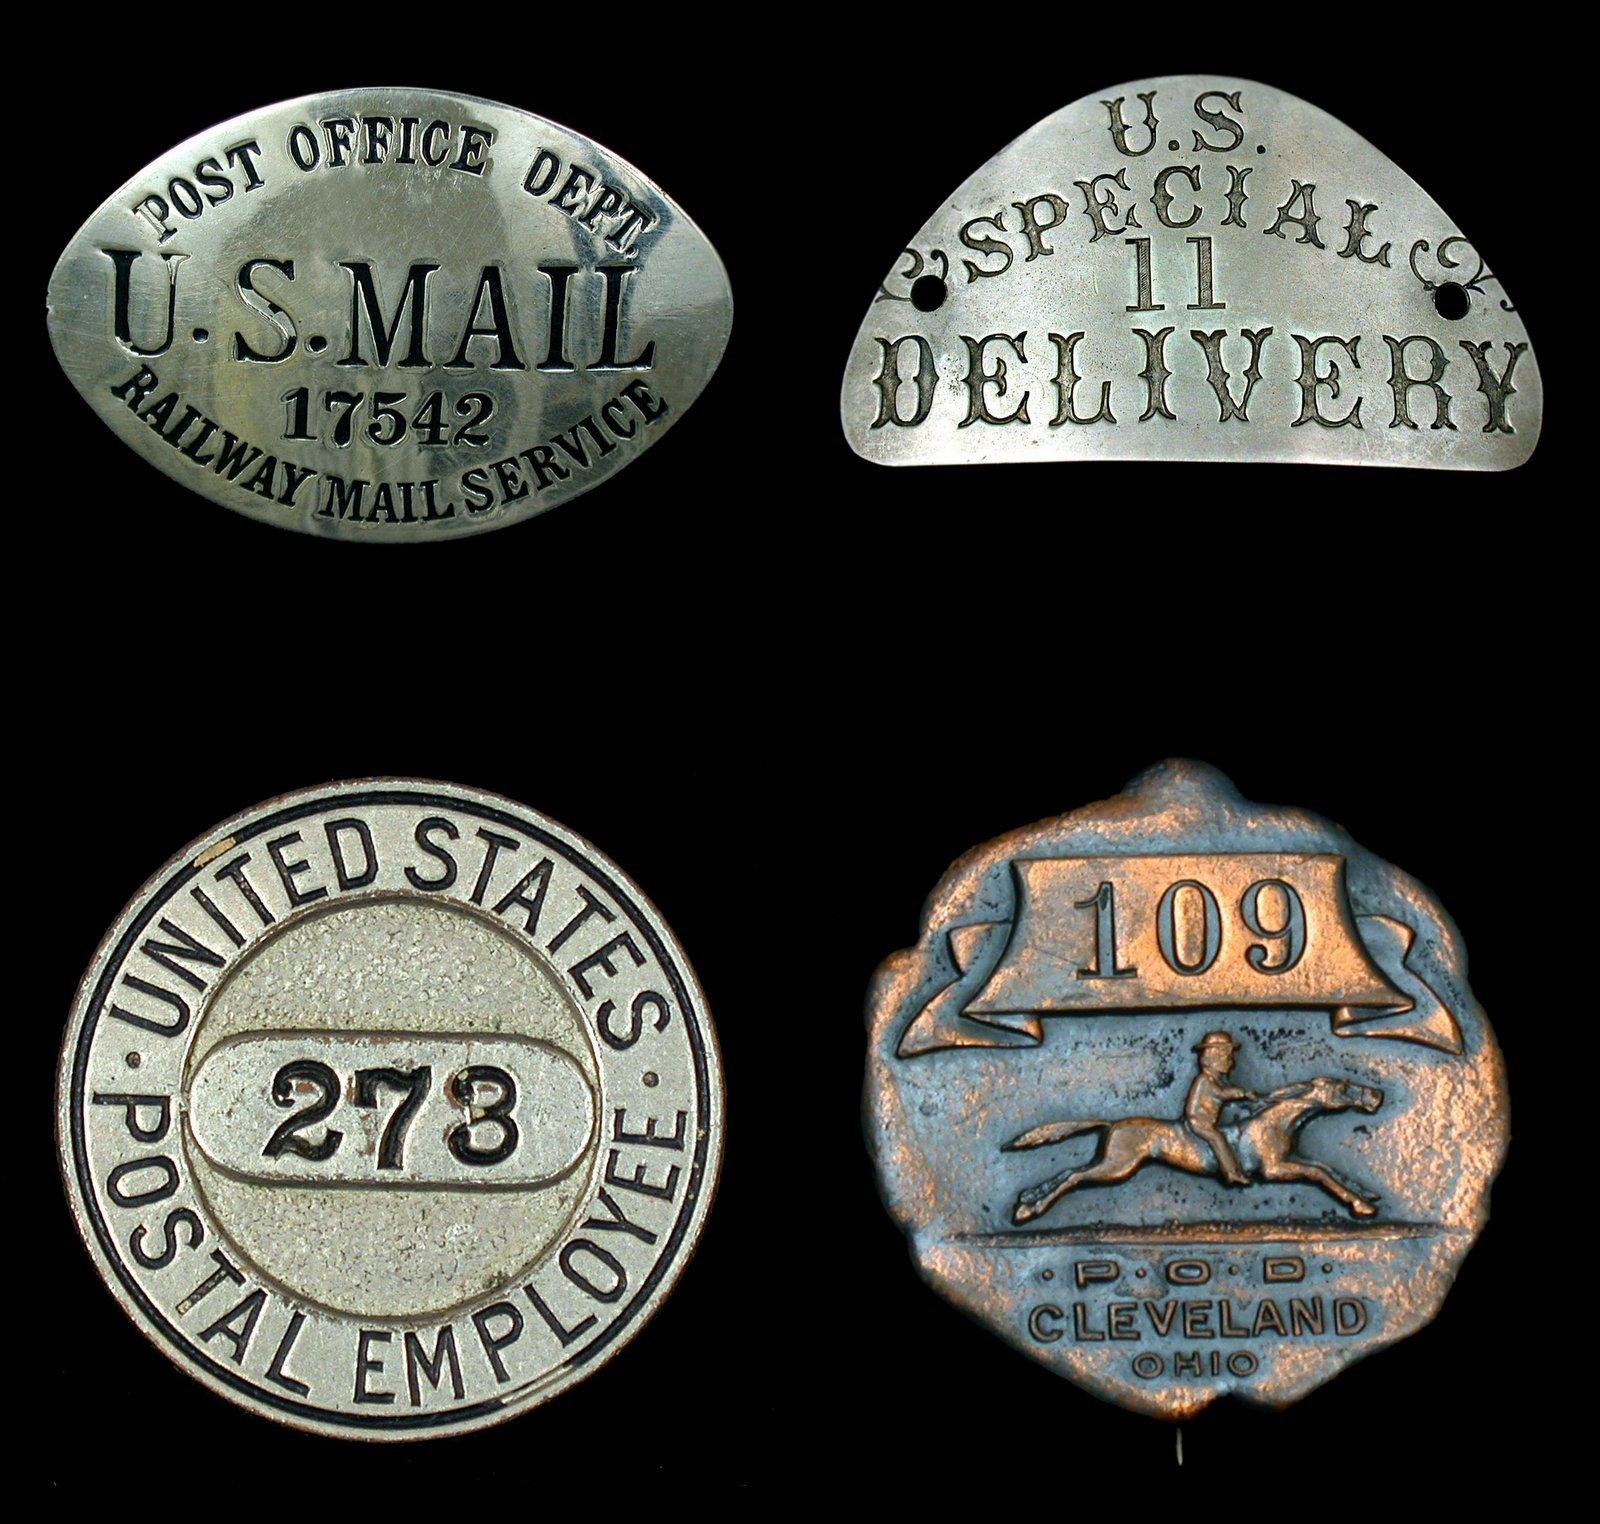 Postal service history: Antique USPS postal service badges and pins